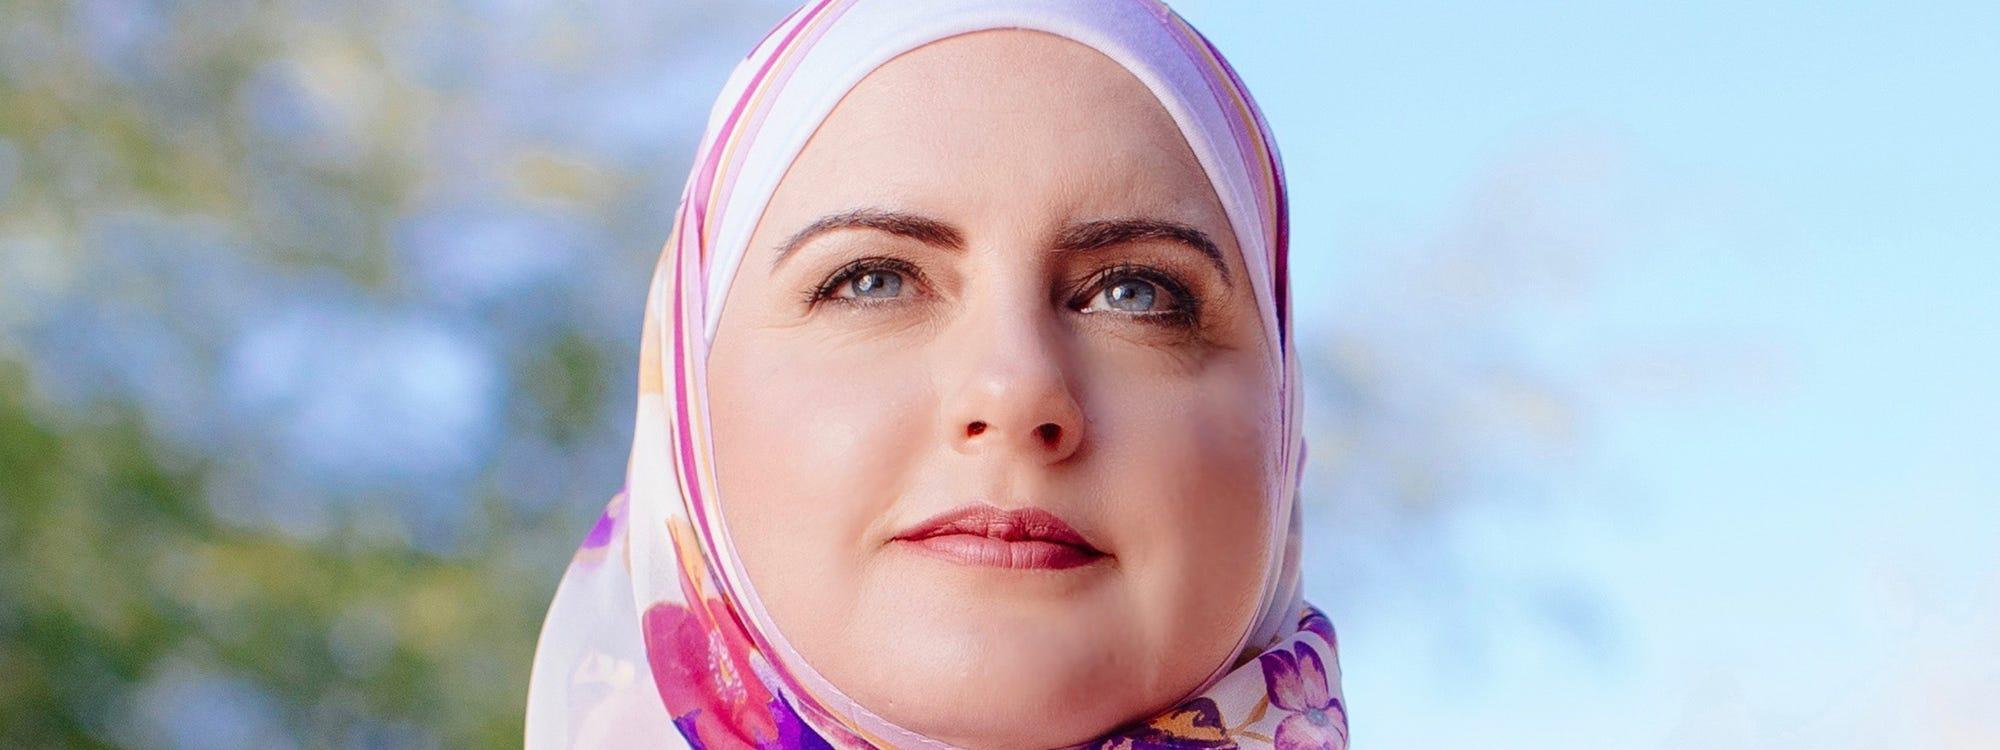 Deedra Abboud Senator Jeff Flake Online Abuse Interview